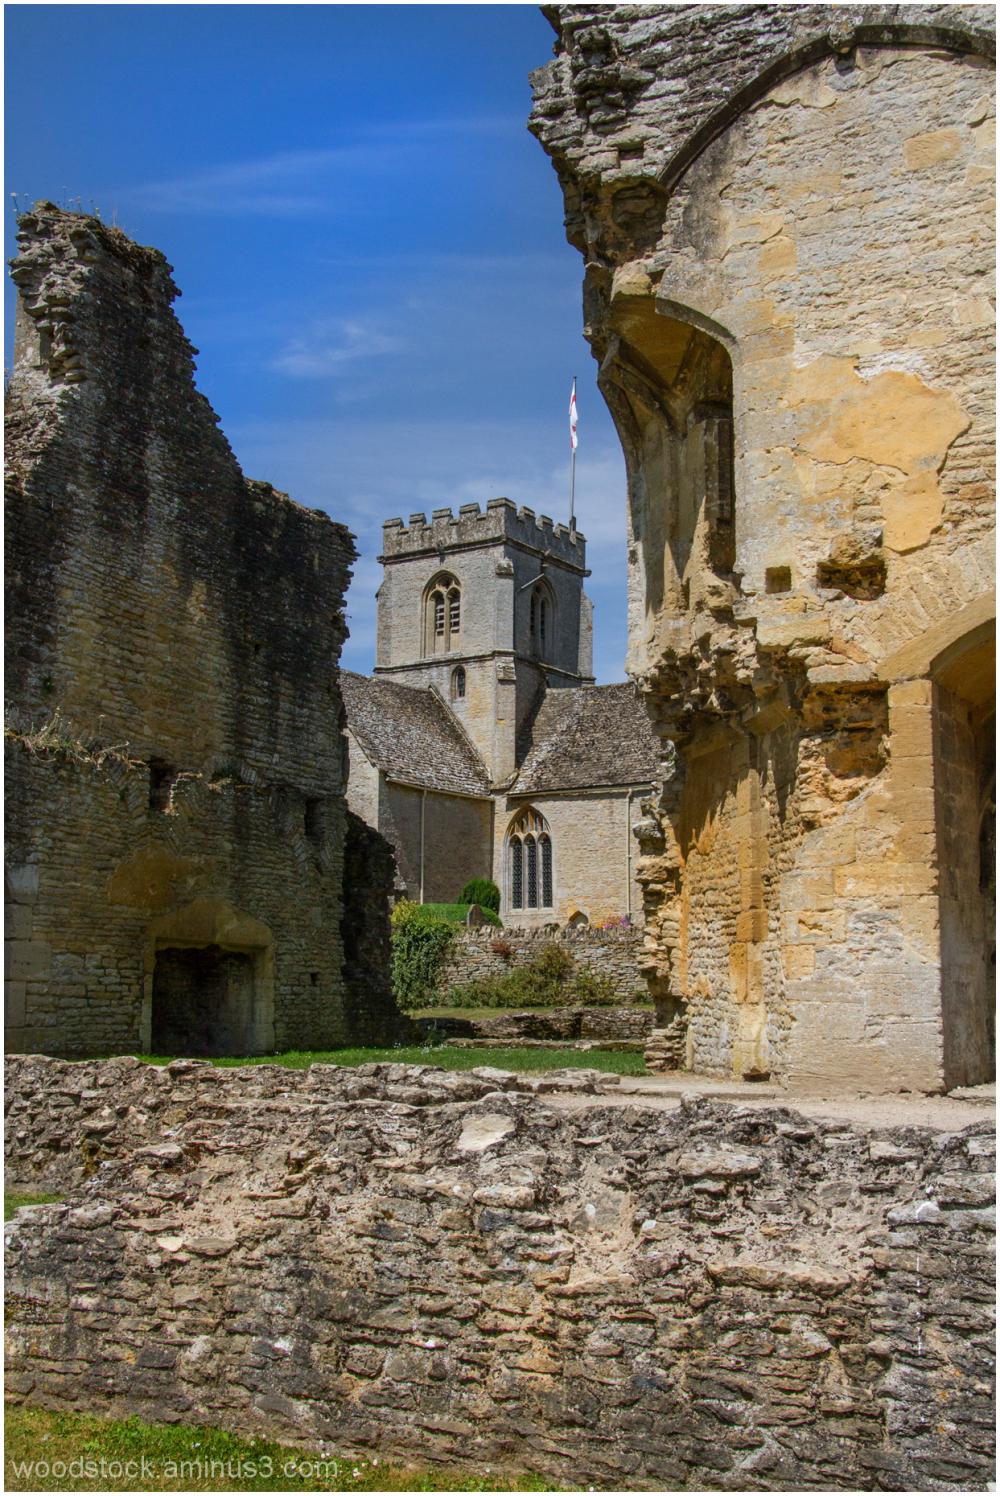 Minster Lovell Church Oxfordshire